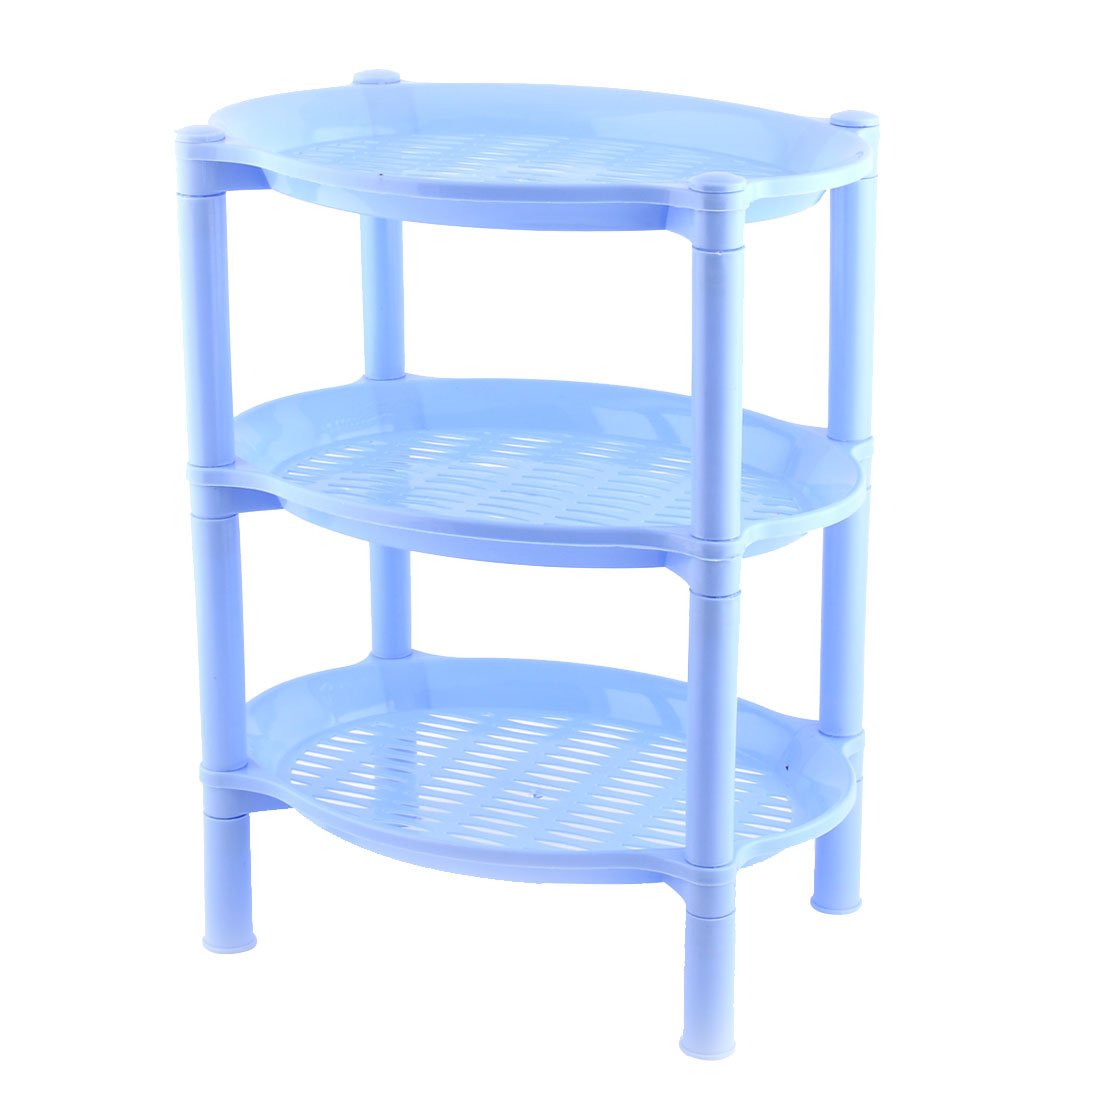 Household Bathroom Plastic Mini 3 Layer Shelf Storage Rack Organizer Blue